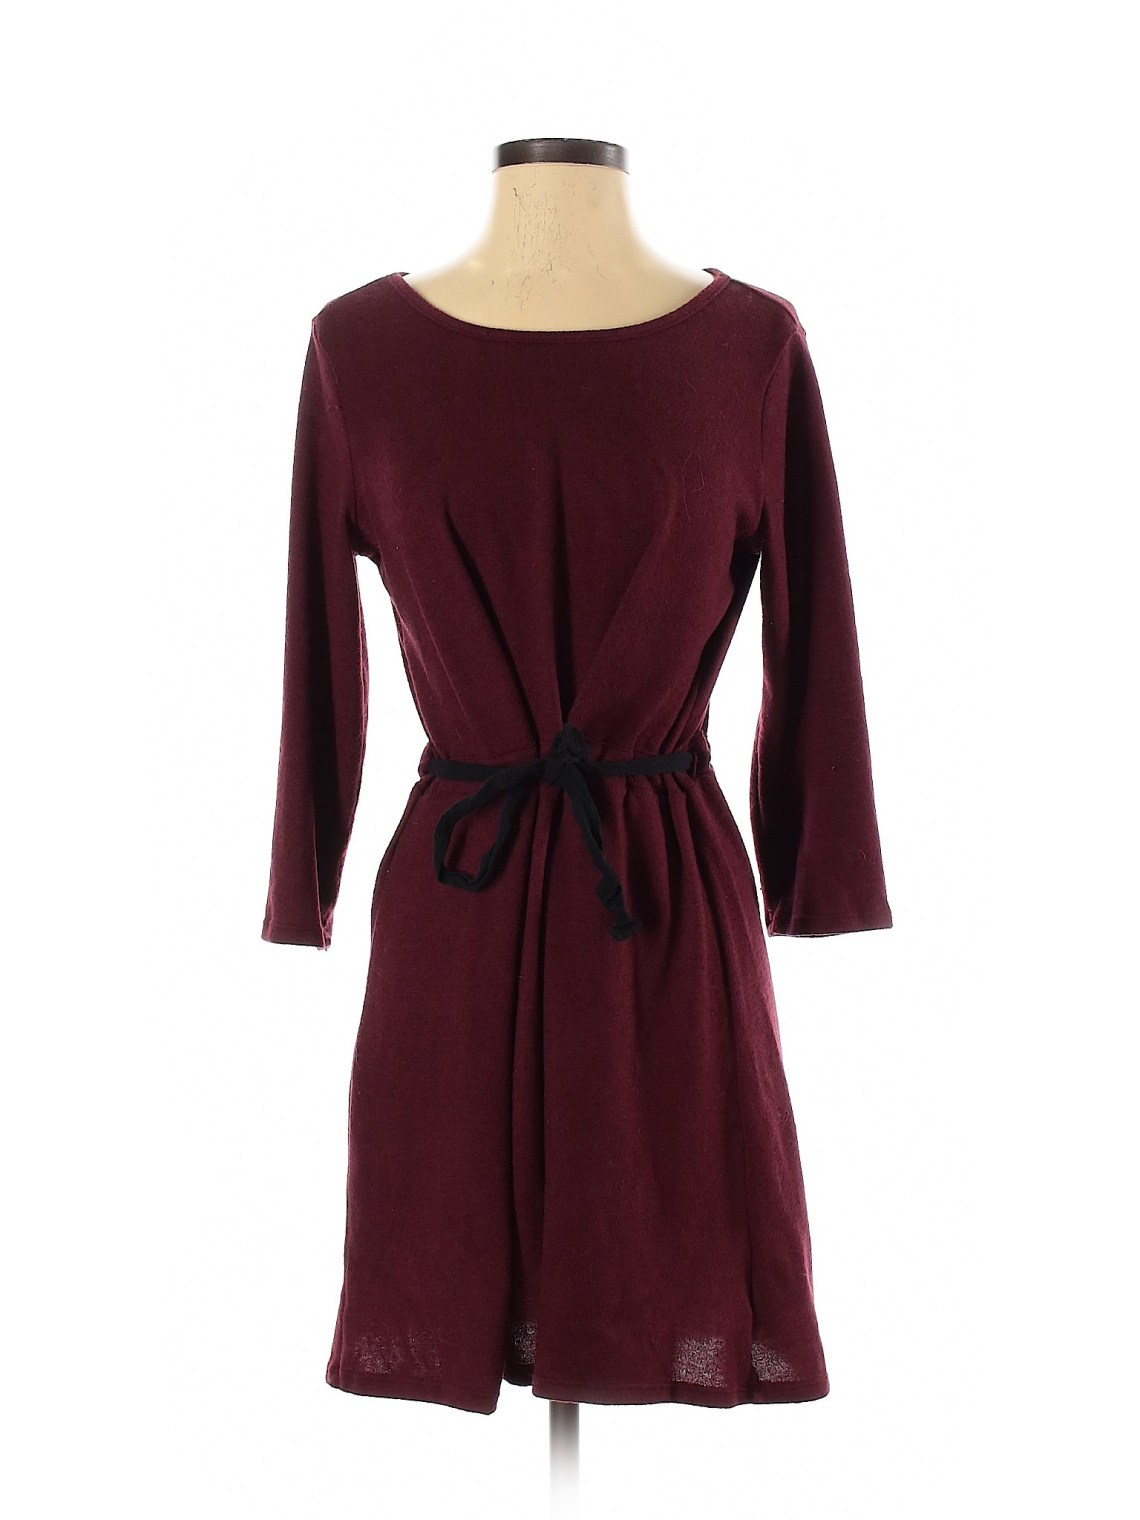 C. Wonder Women Red Casual Dress S | eBay